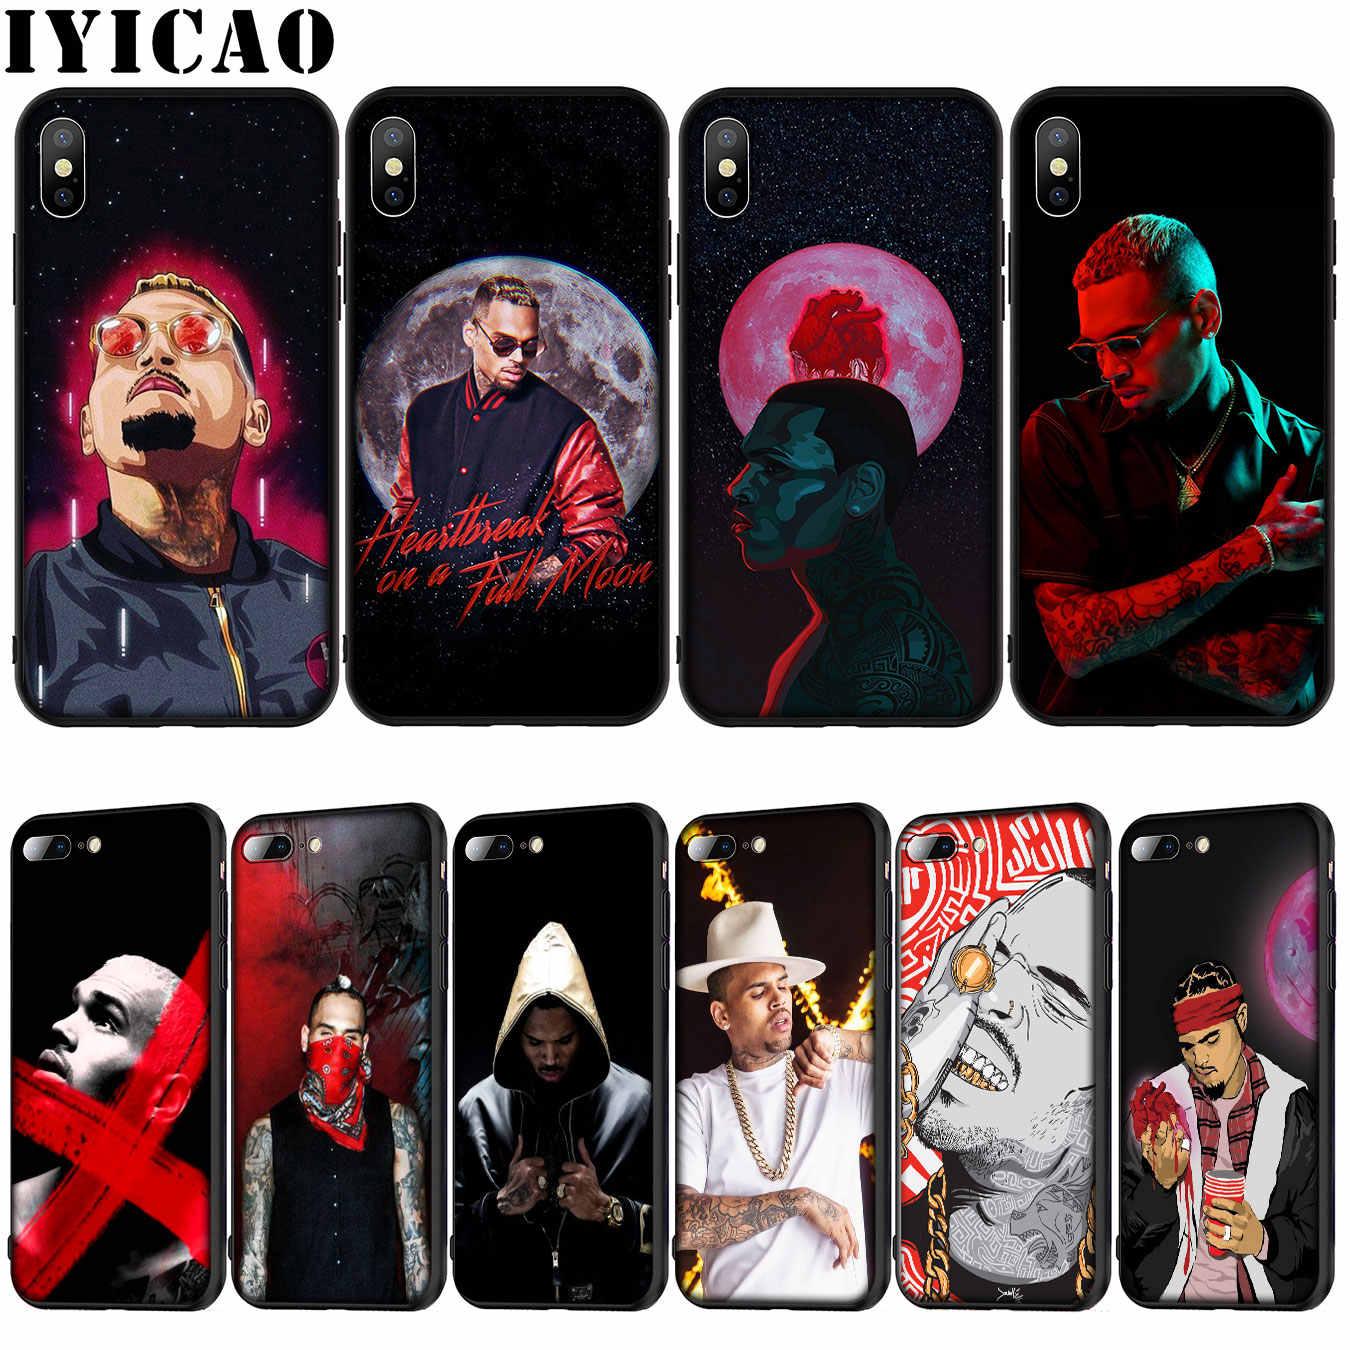 Chris Brown Singer Amazing iphone case